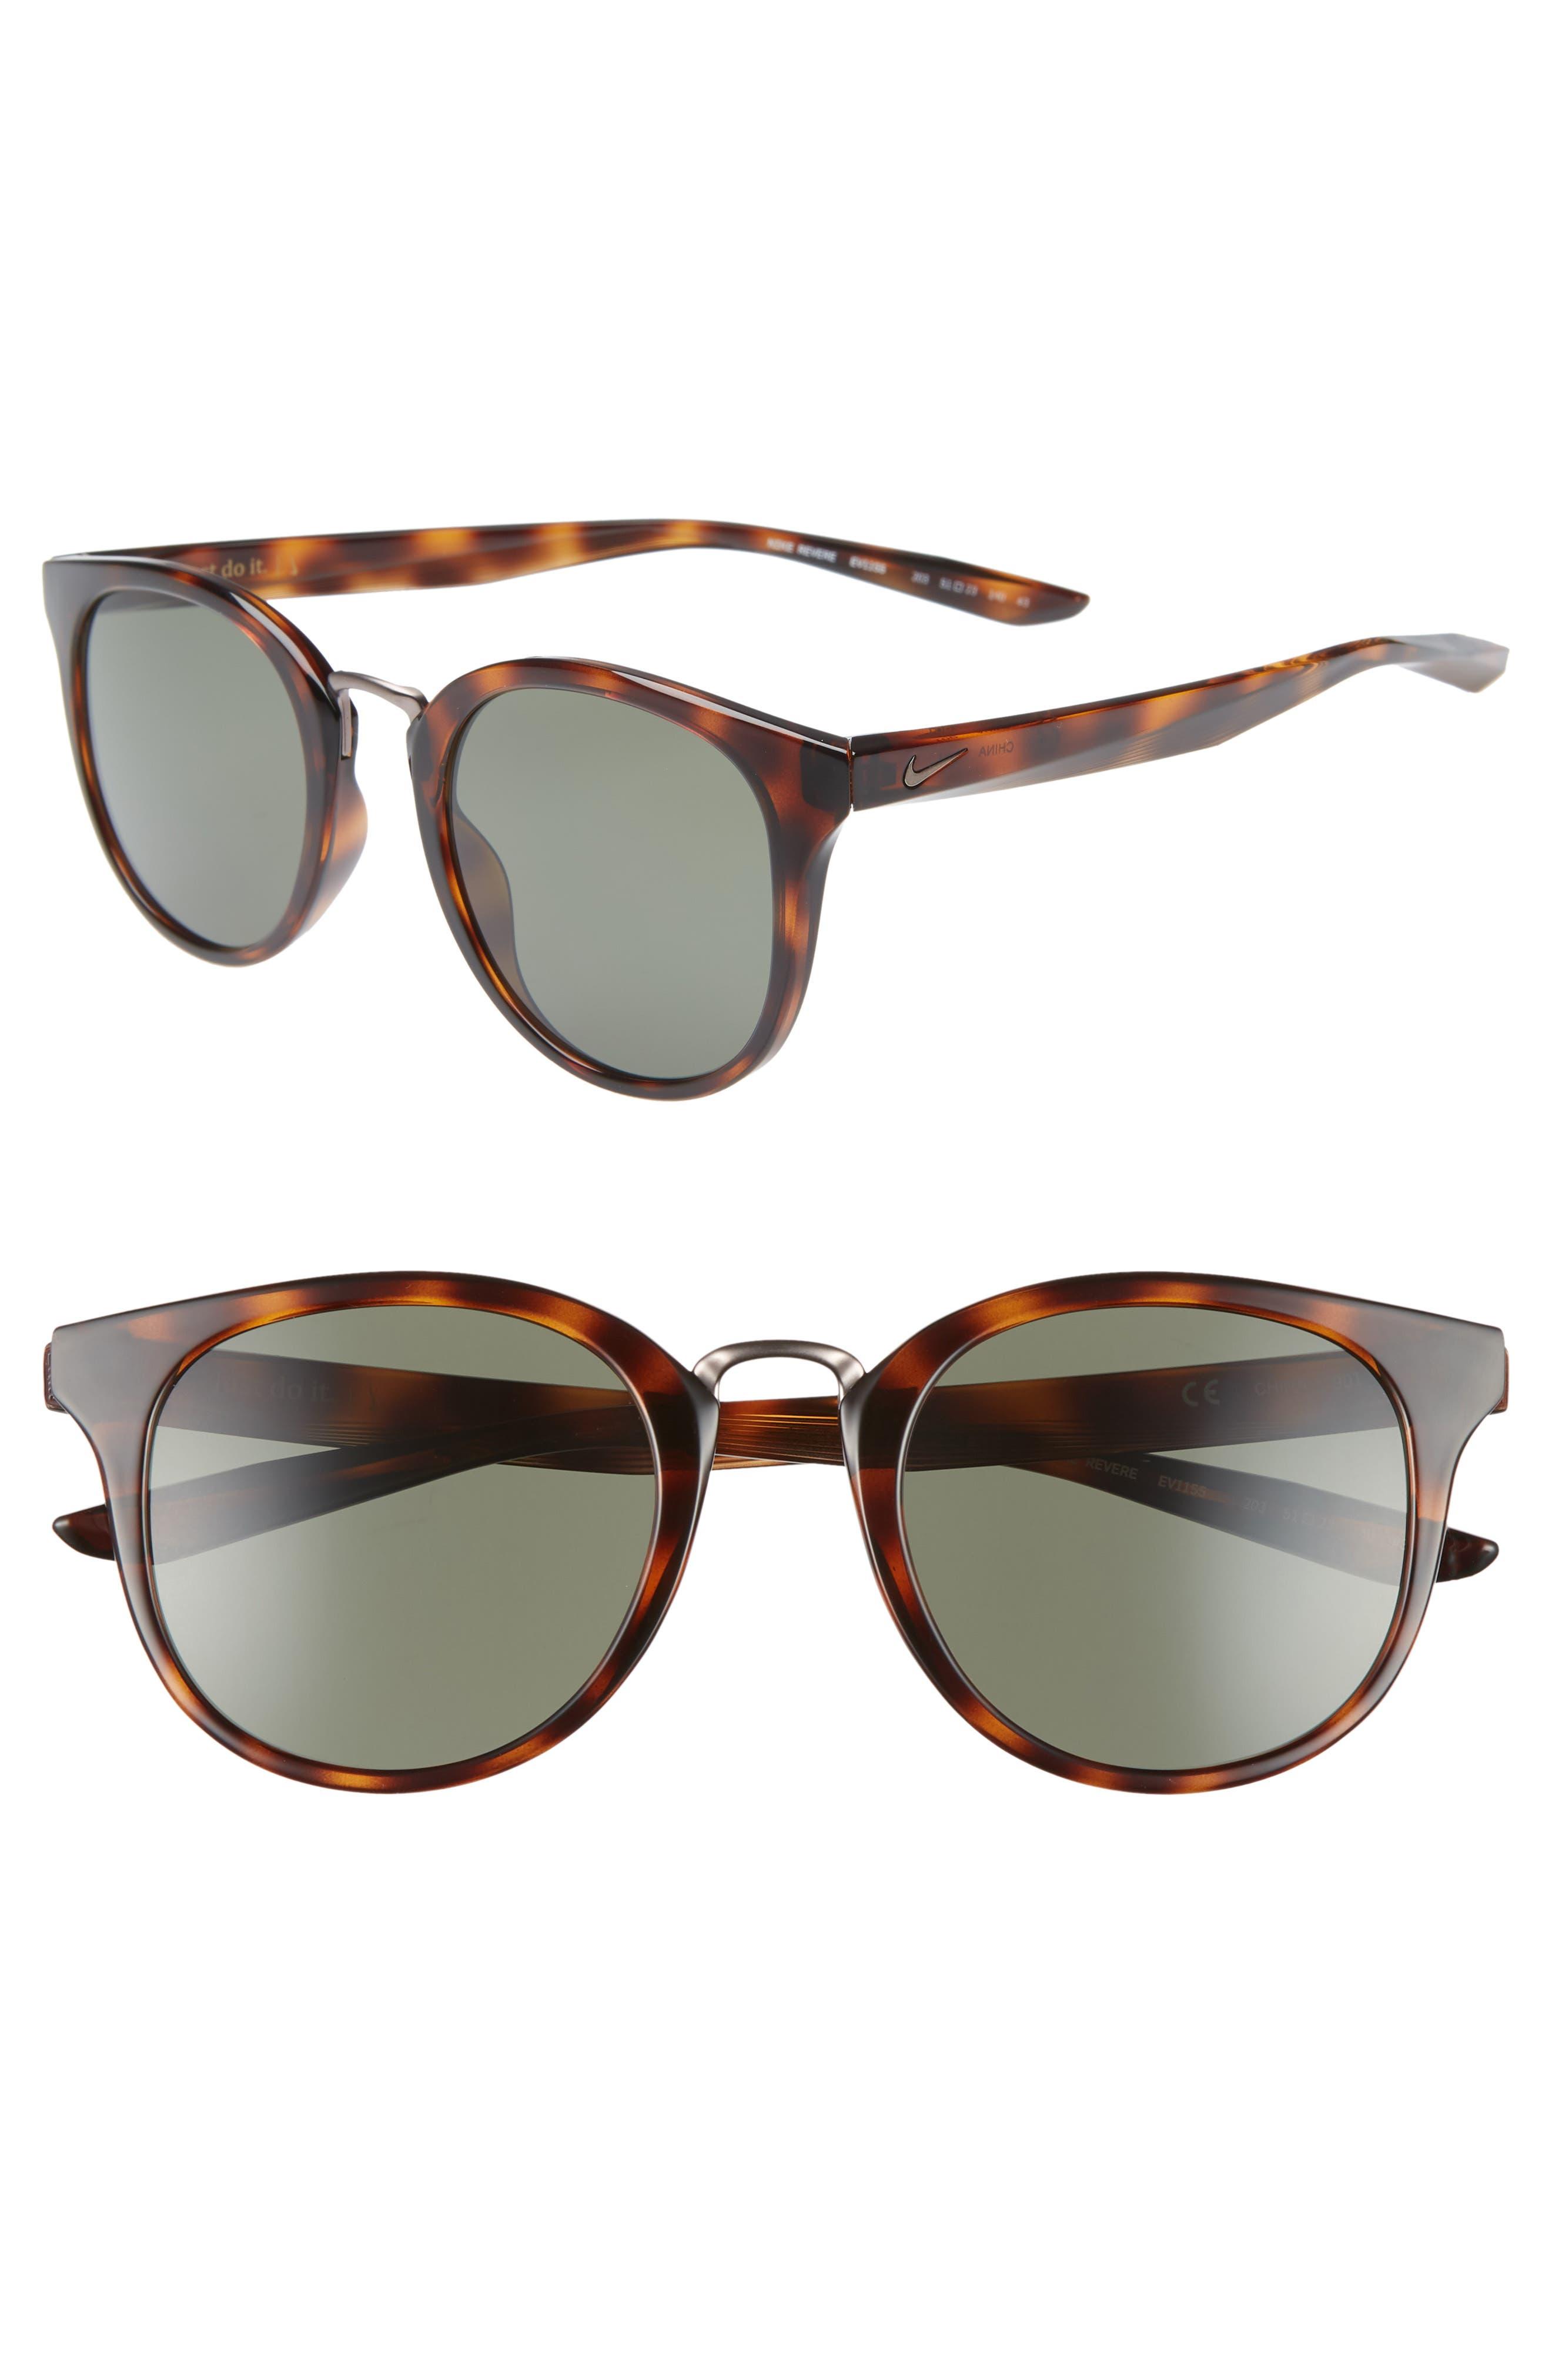 Nike Revere 51Mm Round Sunglasses - Tortoise/ Green